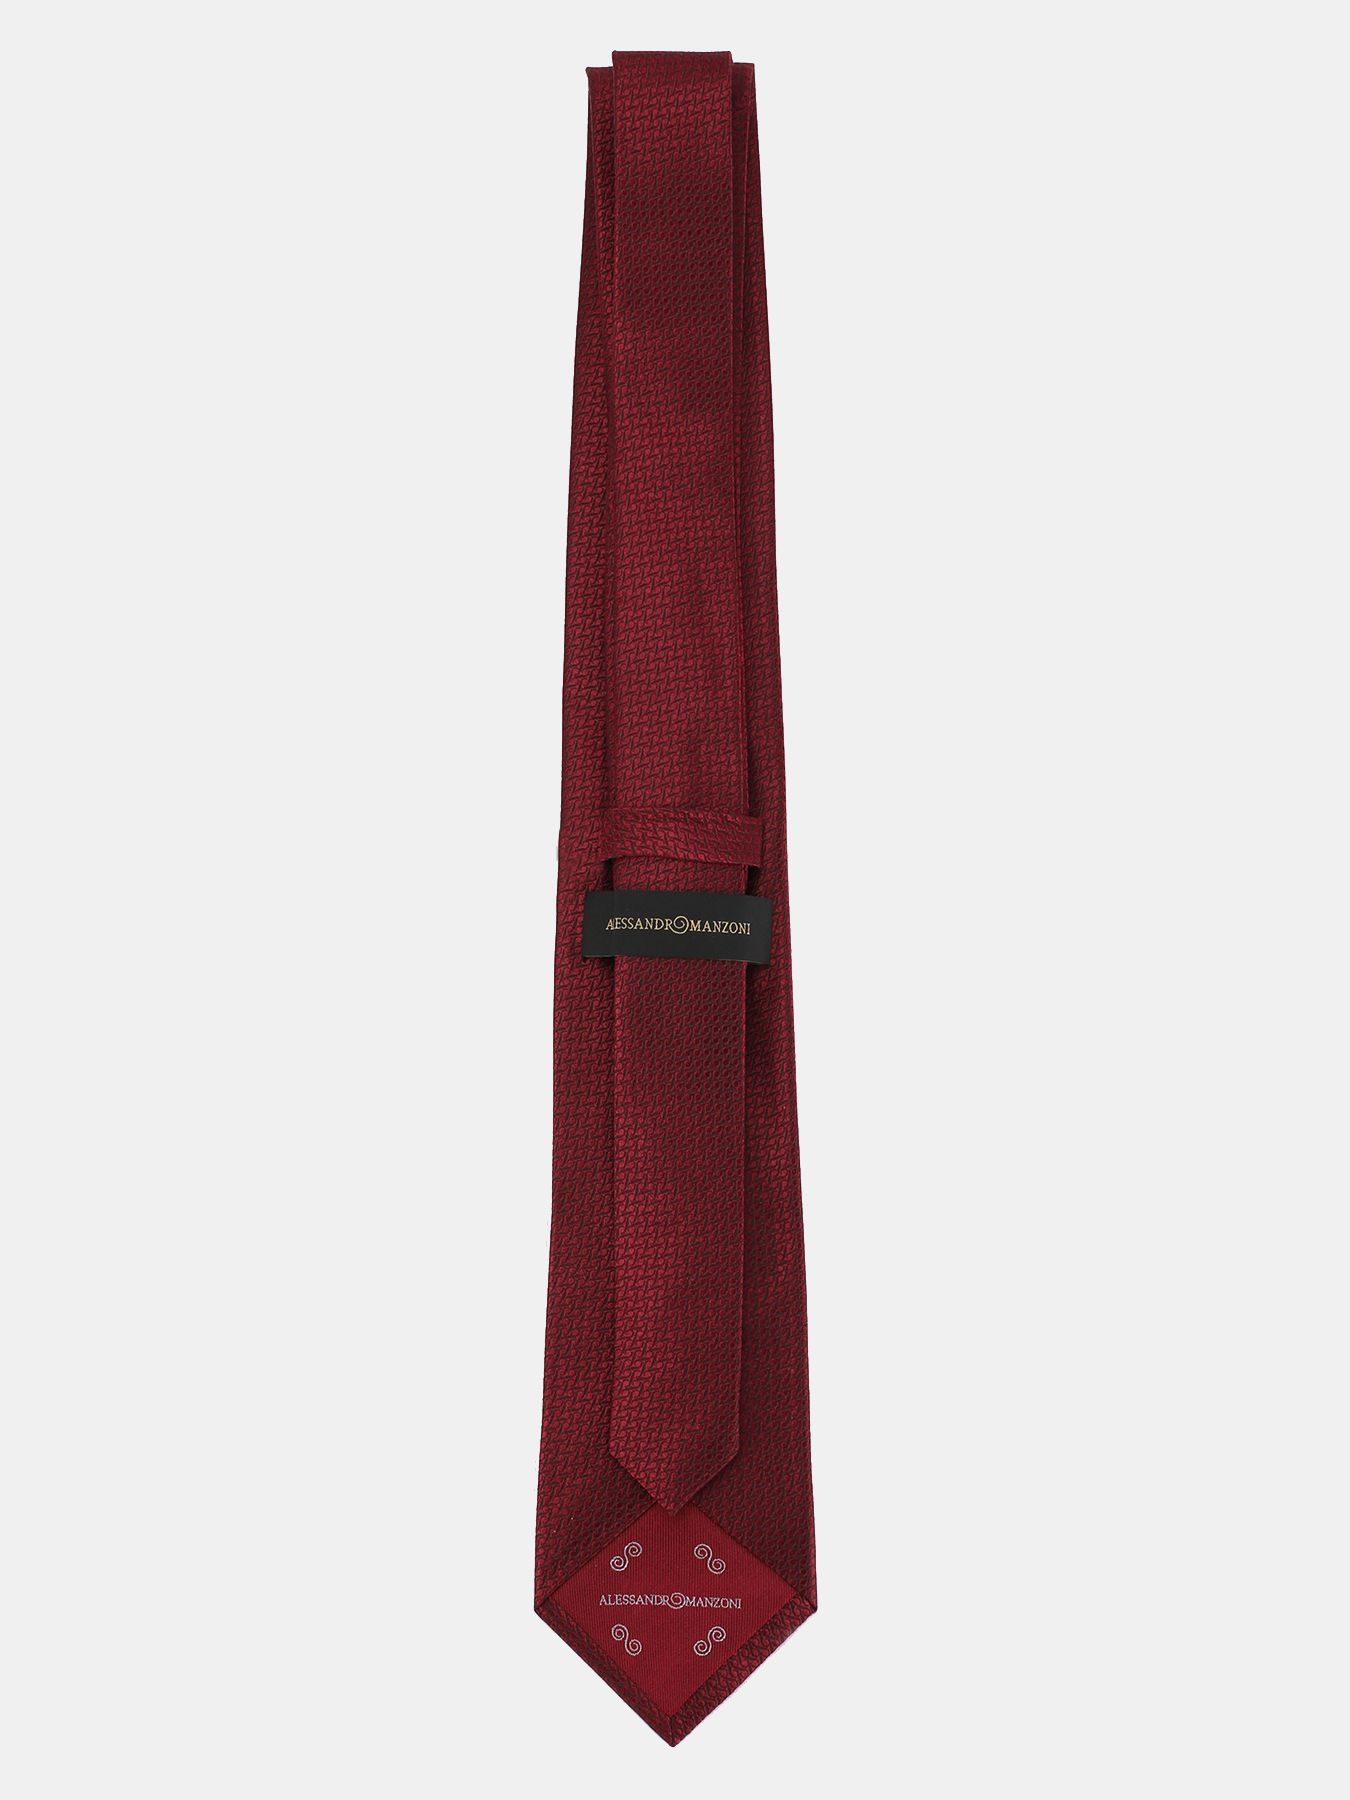 Alessandro Manzoni Шелковый галстук с узорами 324195-185 Фото 2